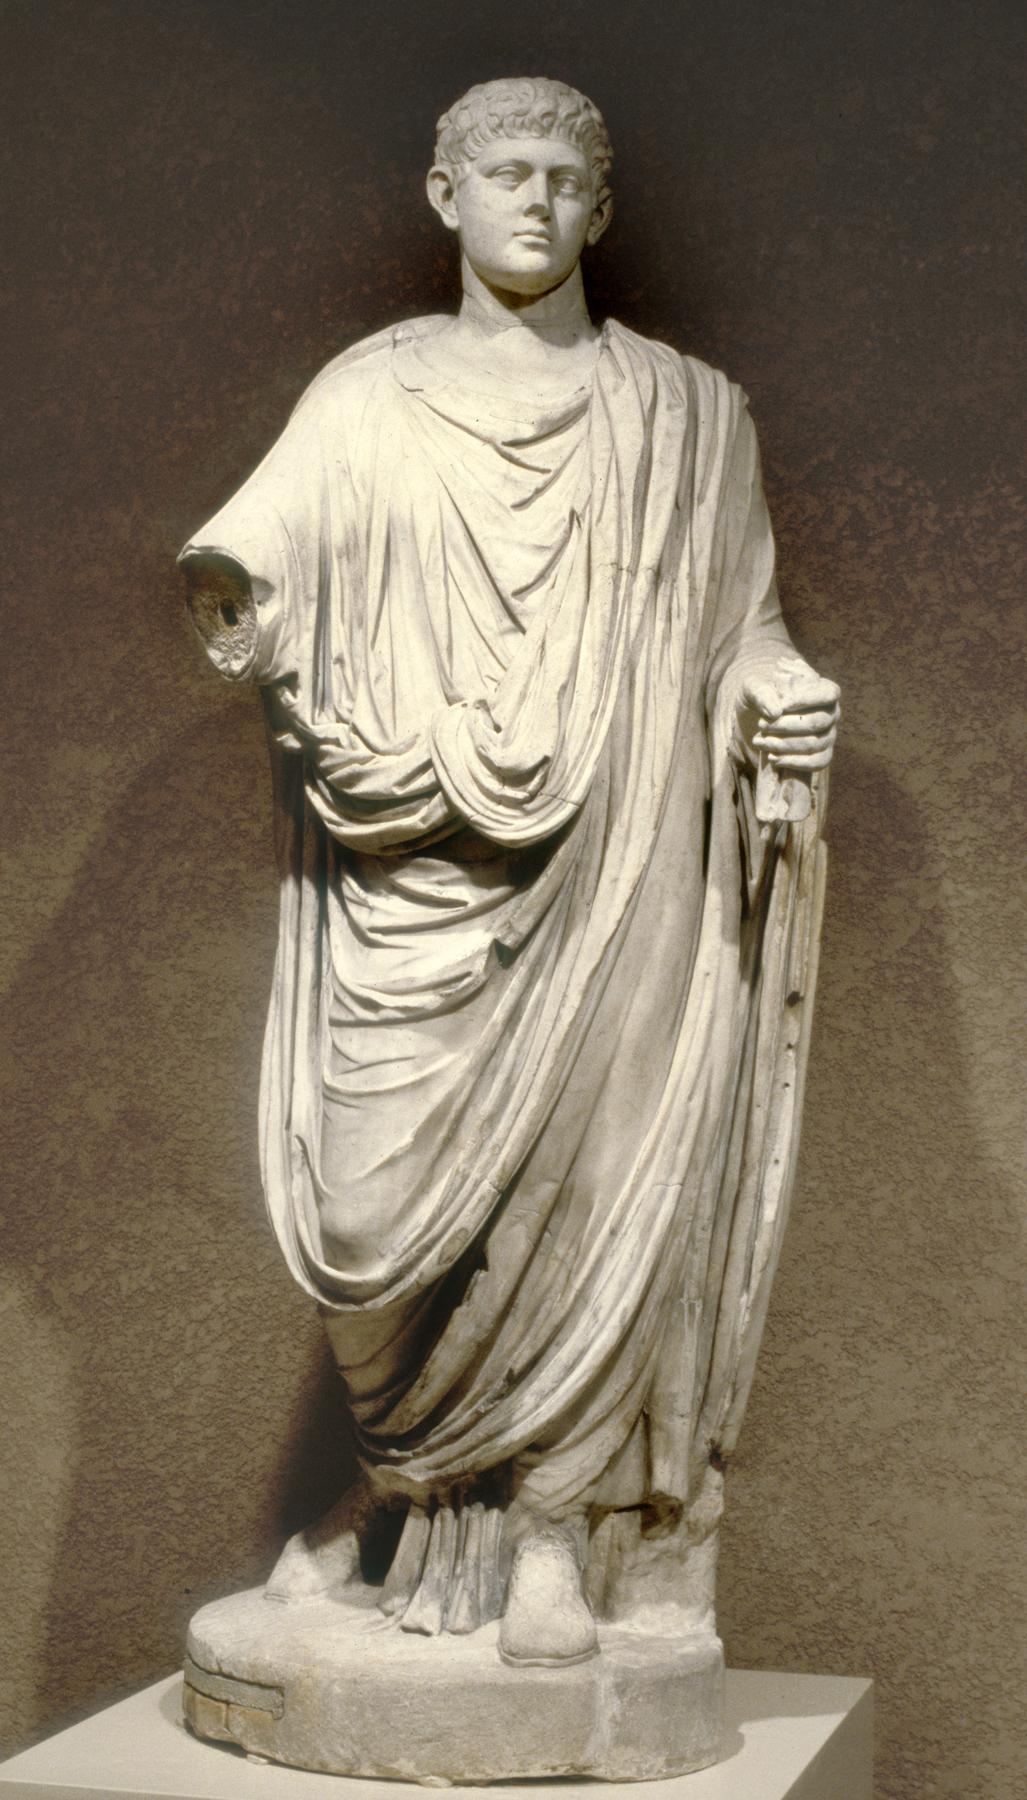 [Image: Roman_-_Emperor_Wearing_a_Toga_-_Walters_23226.jpg]